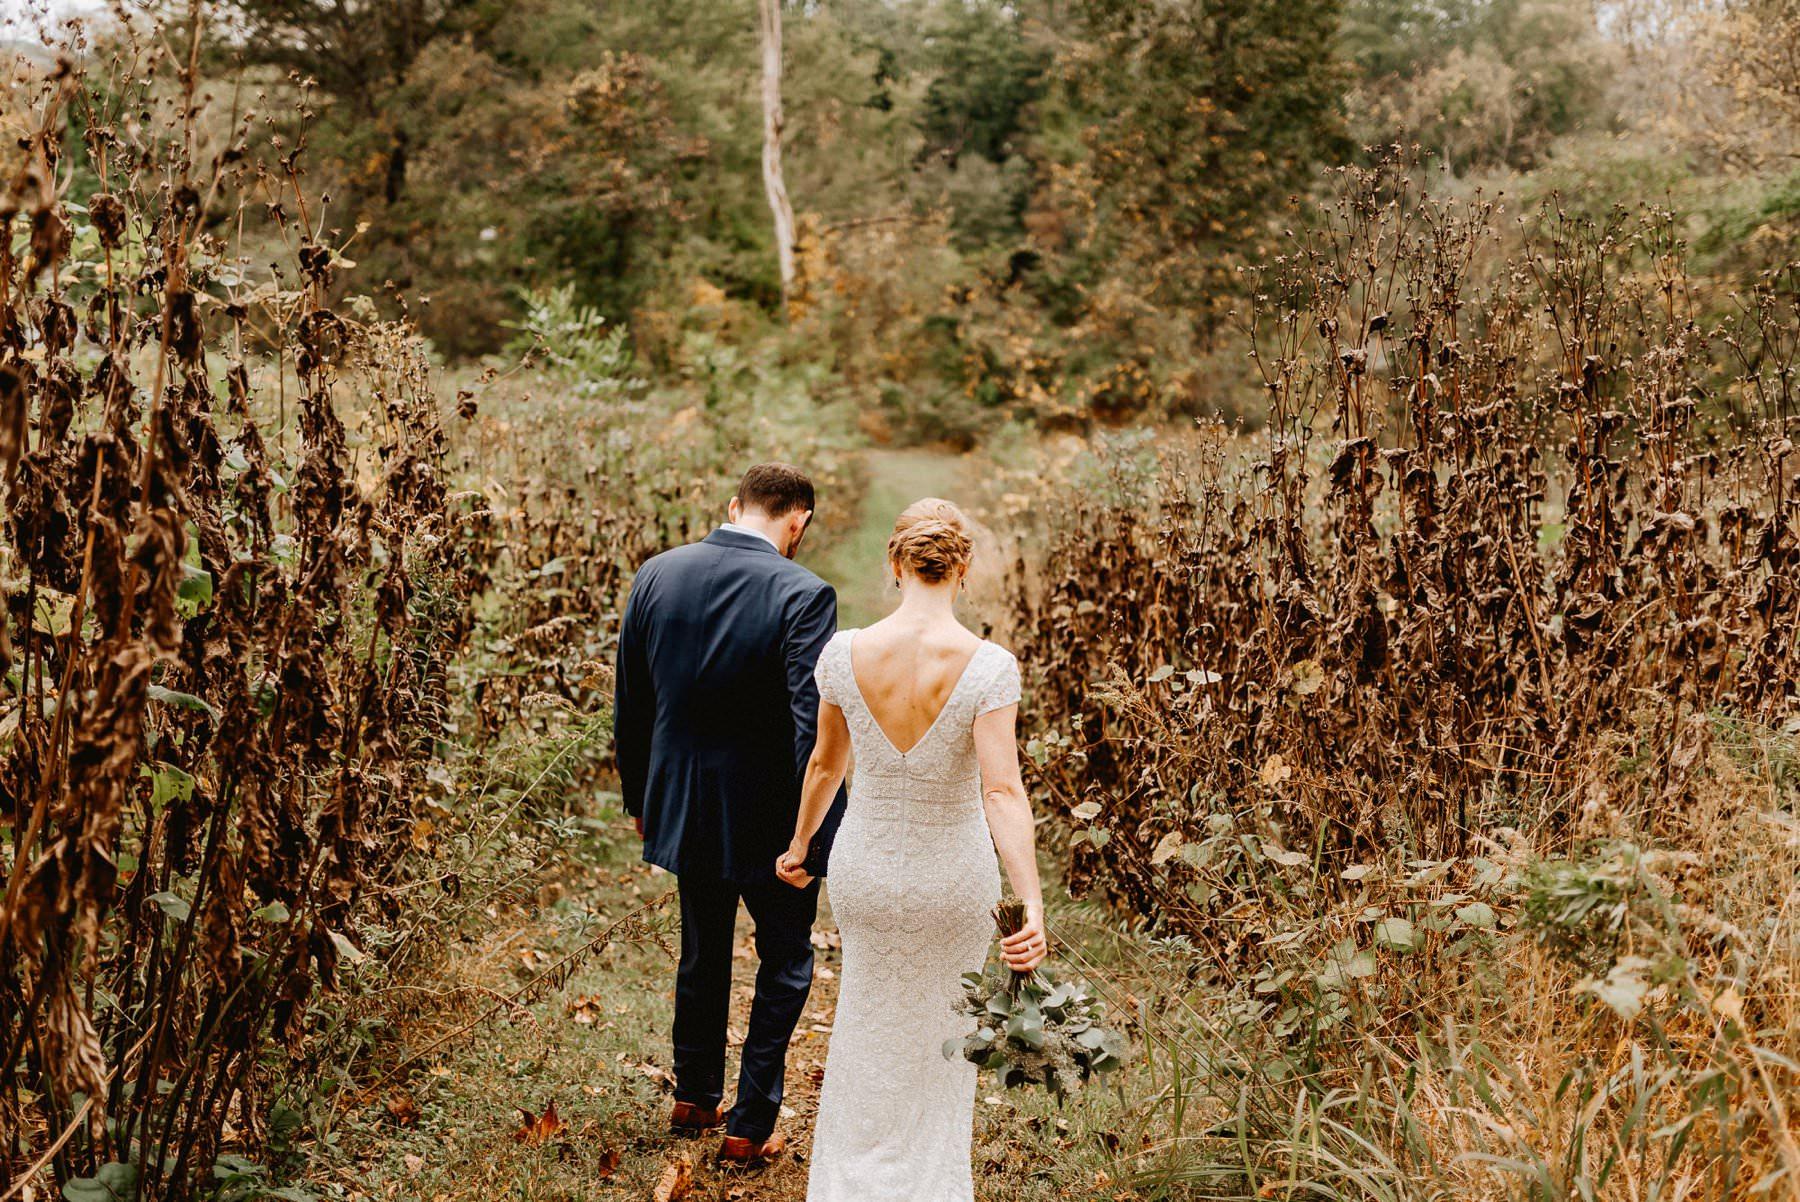 John_James_Audubon_Center_wedding-32.jpg